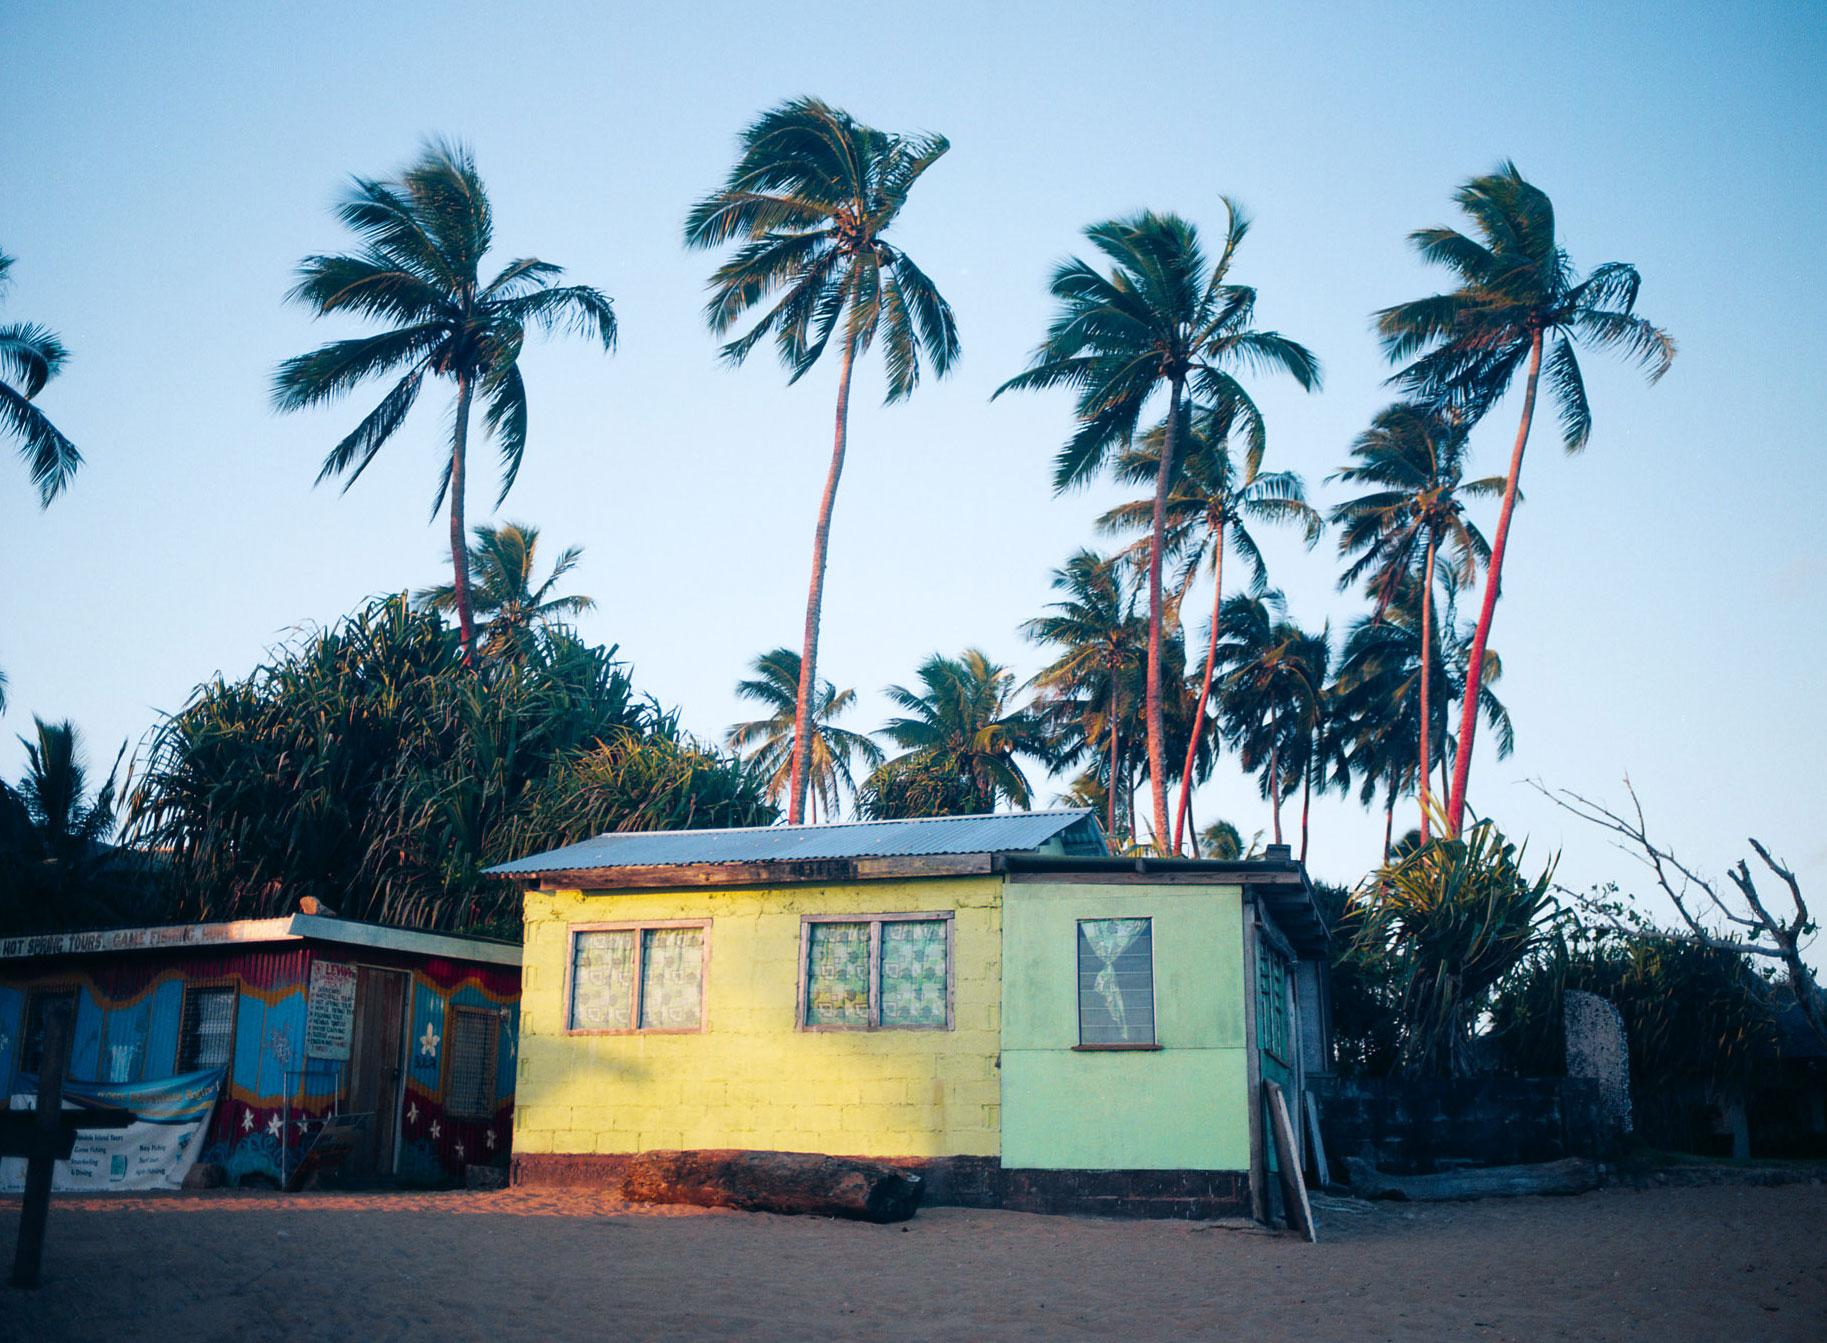 Fiji2017 (1 of 1).jpg